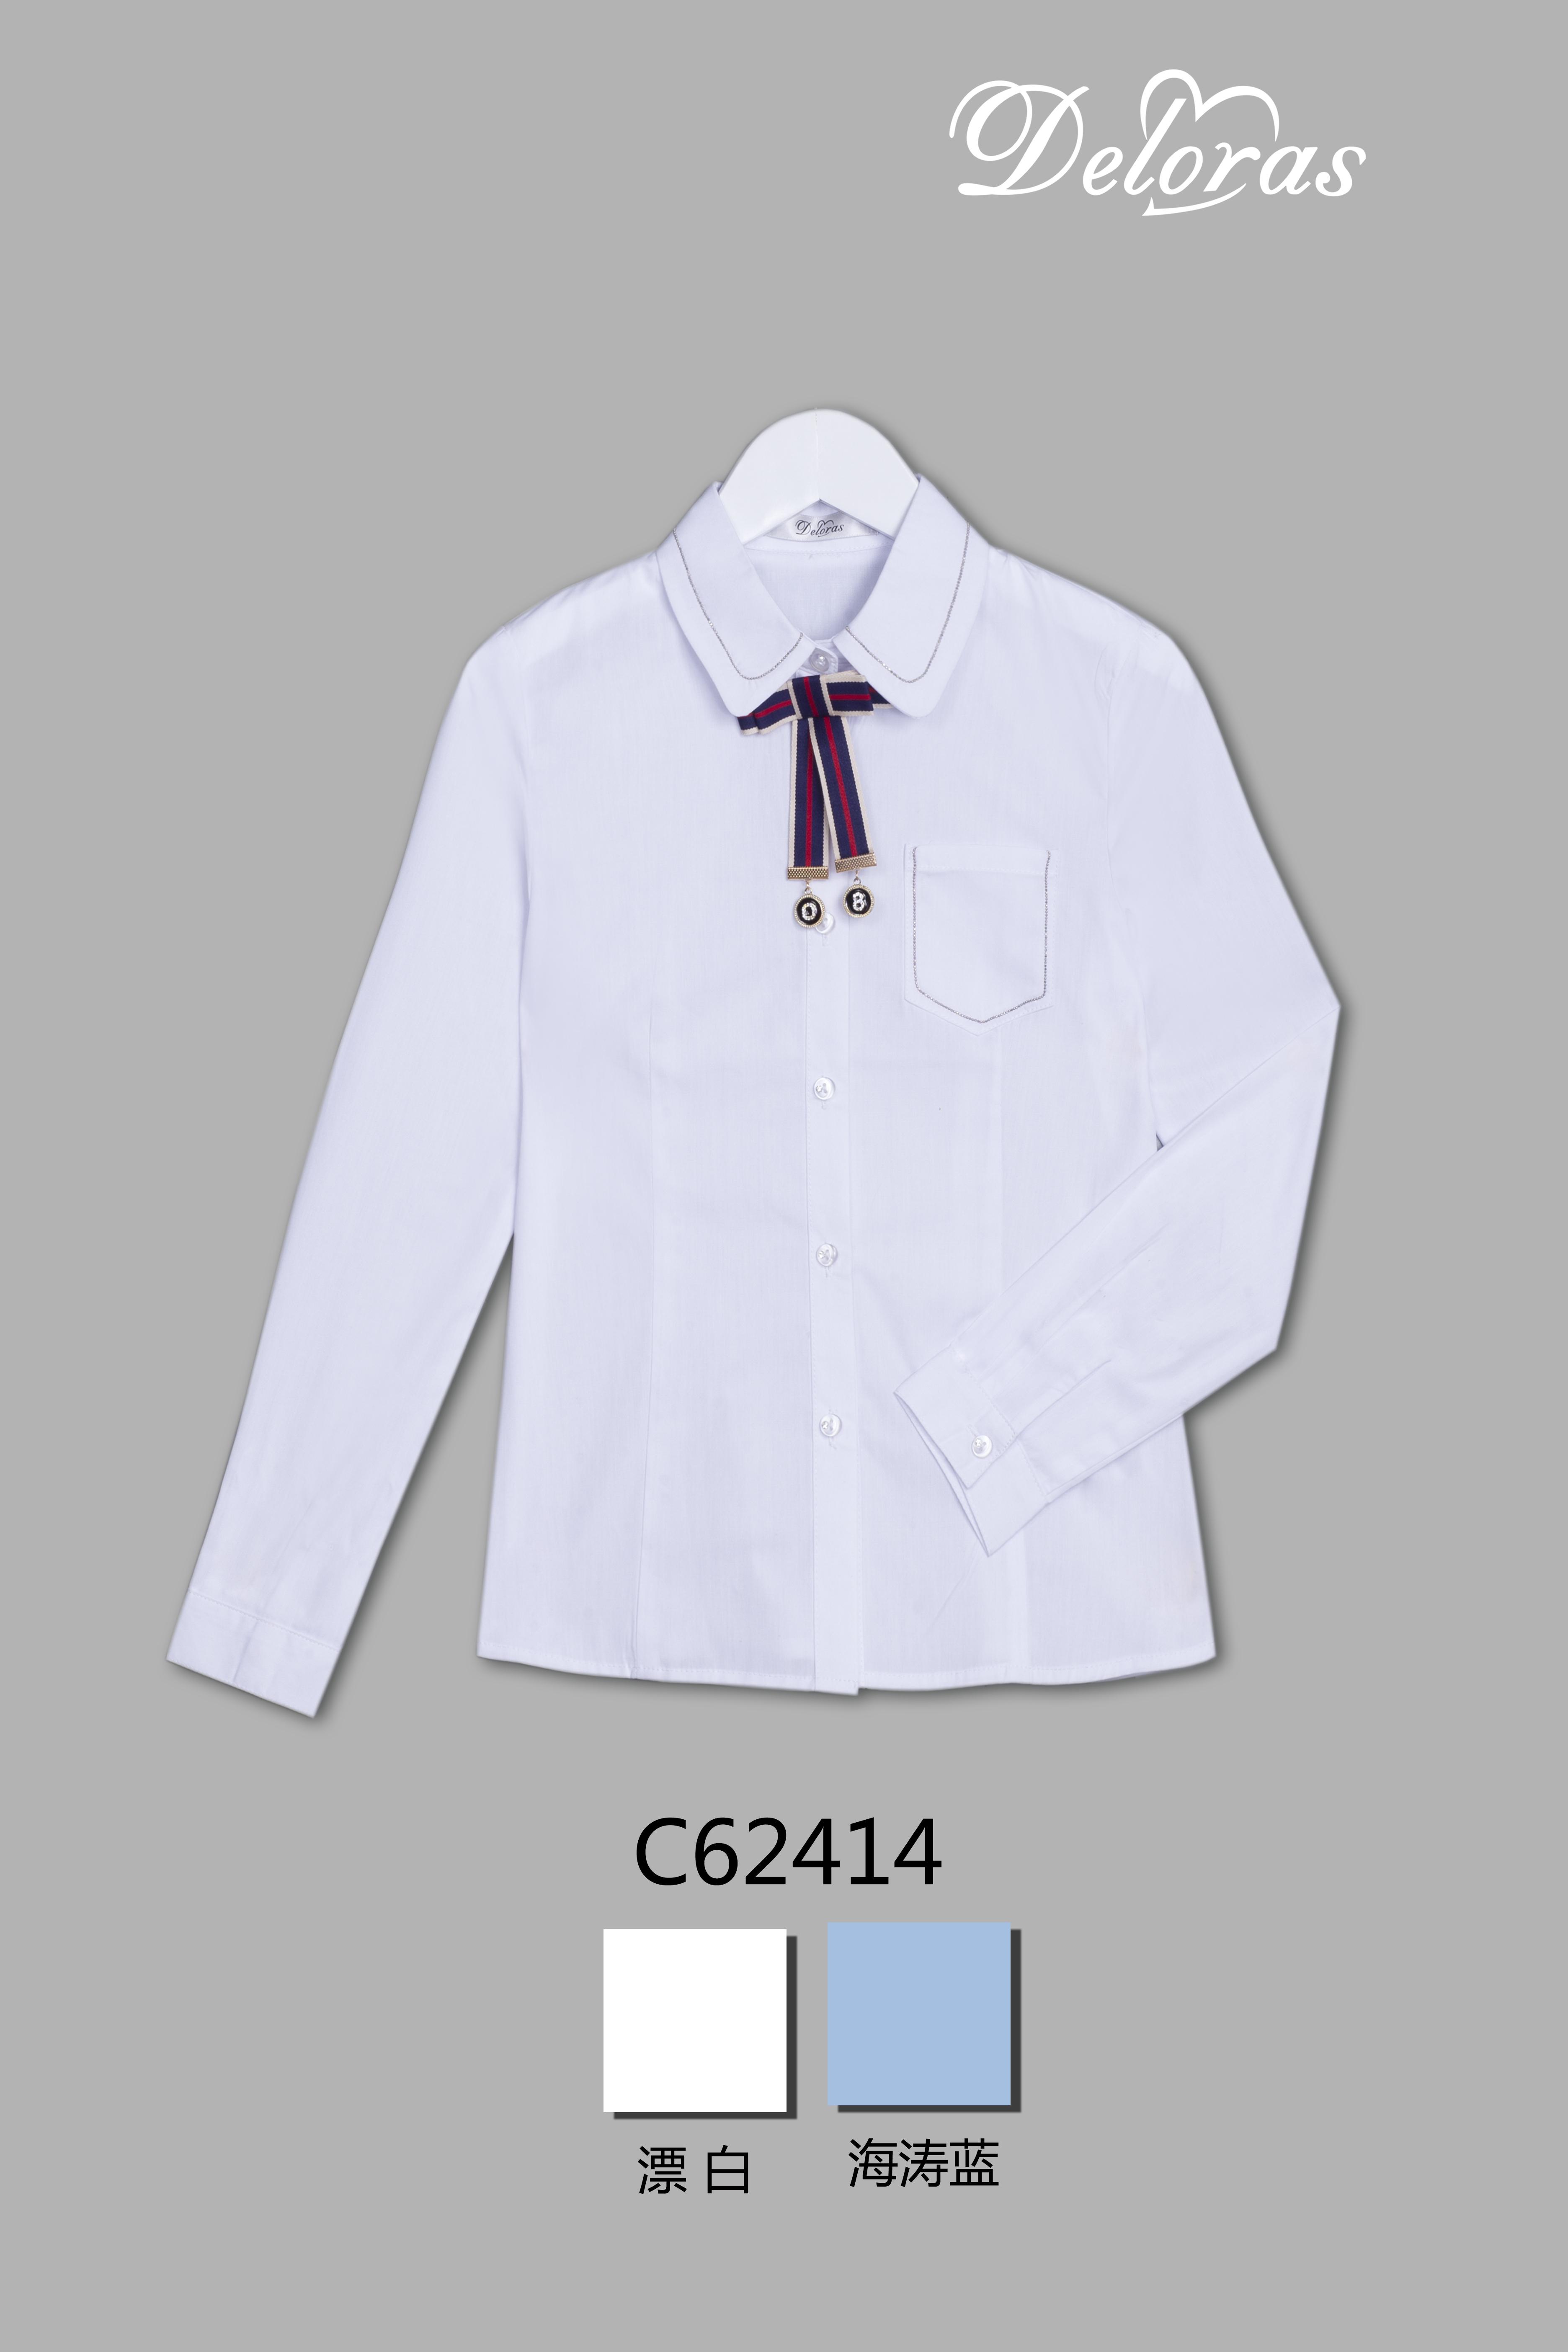 Блузка для девочки BHDL62414